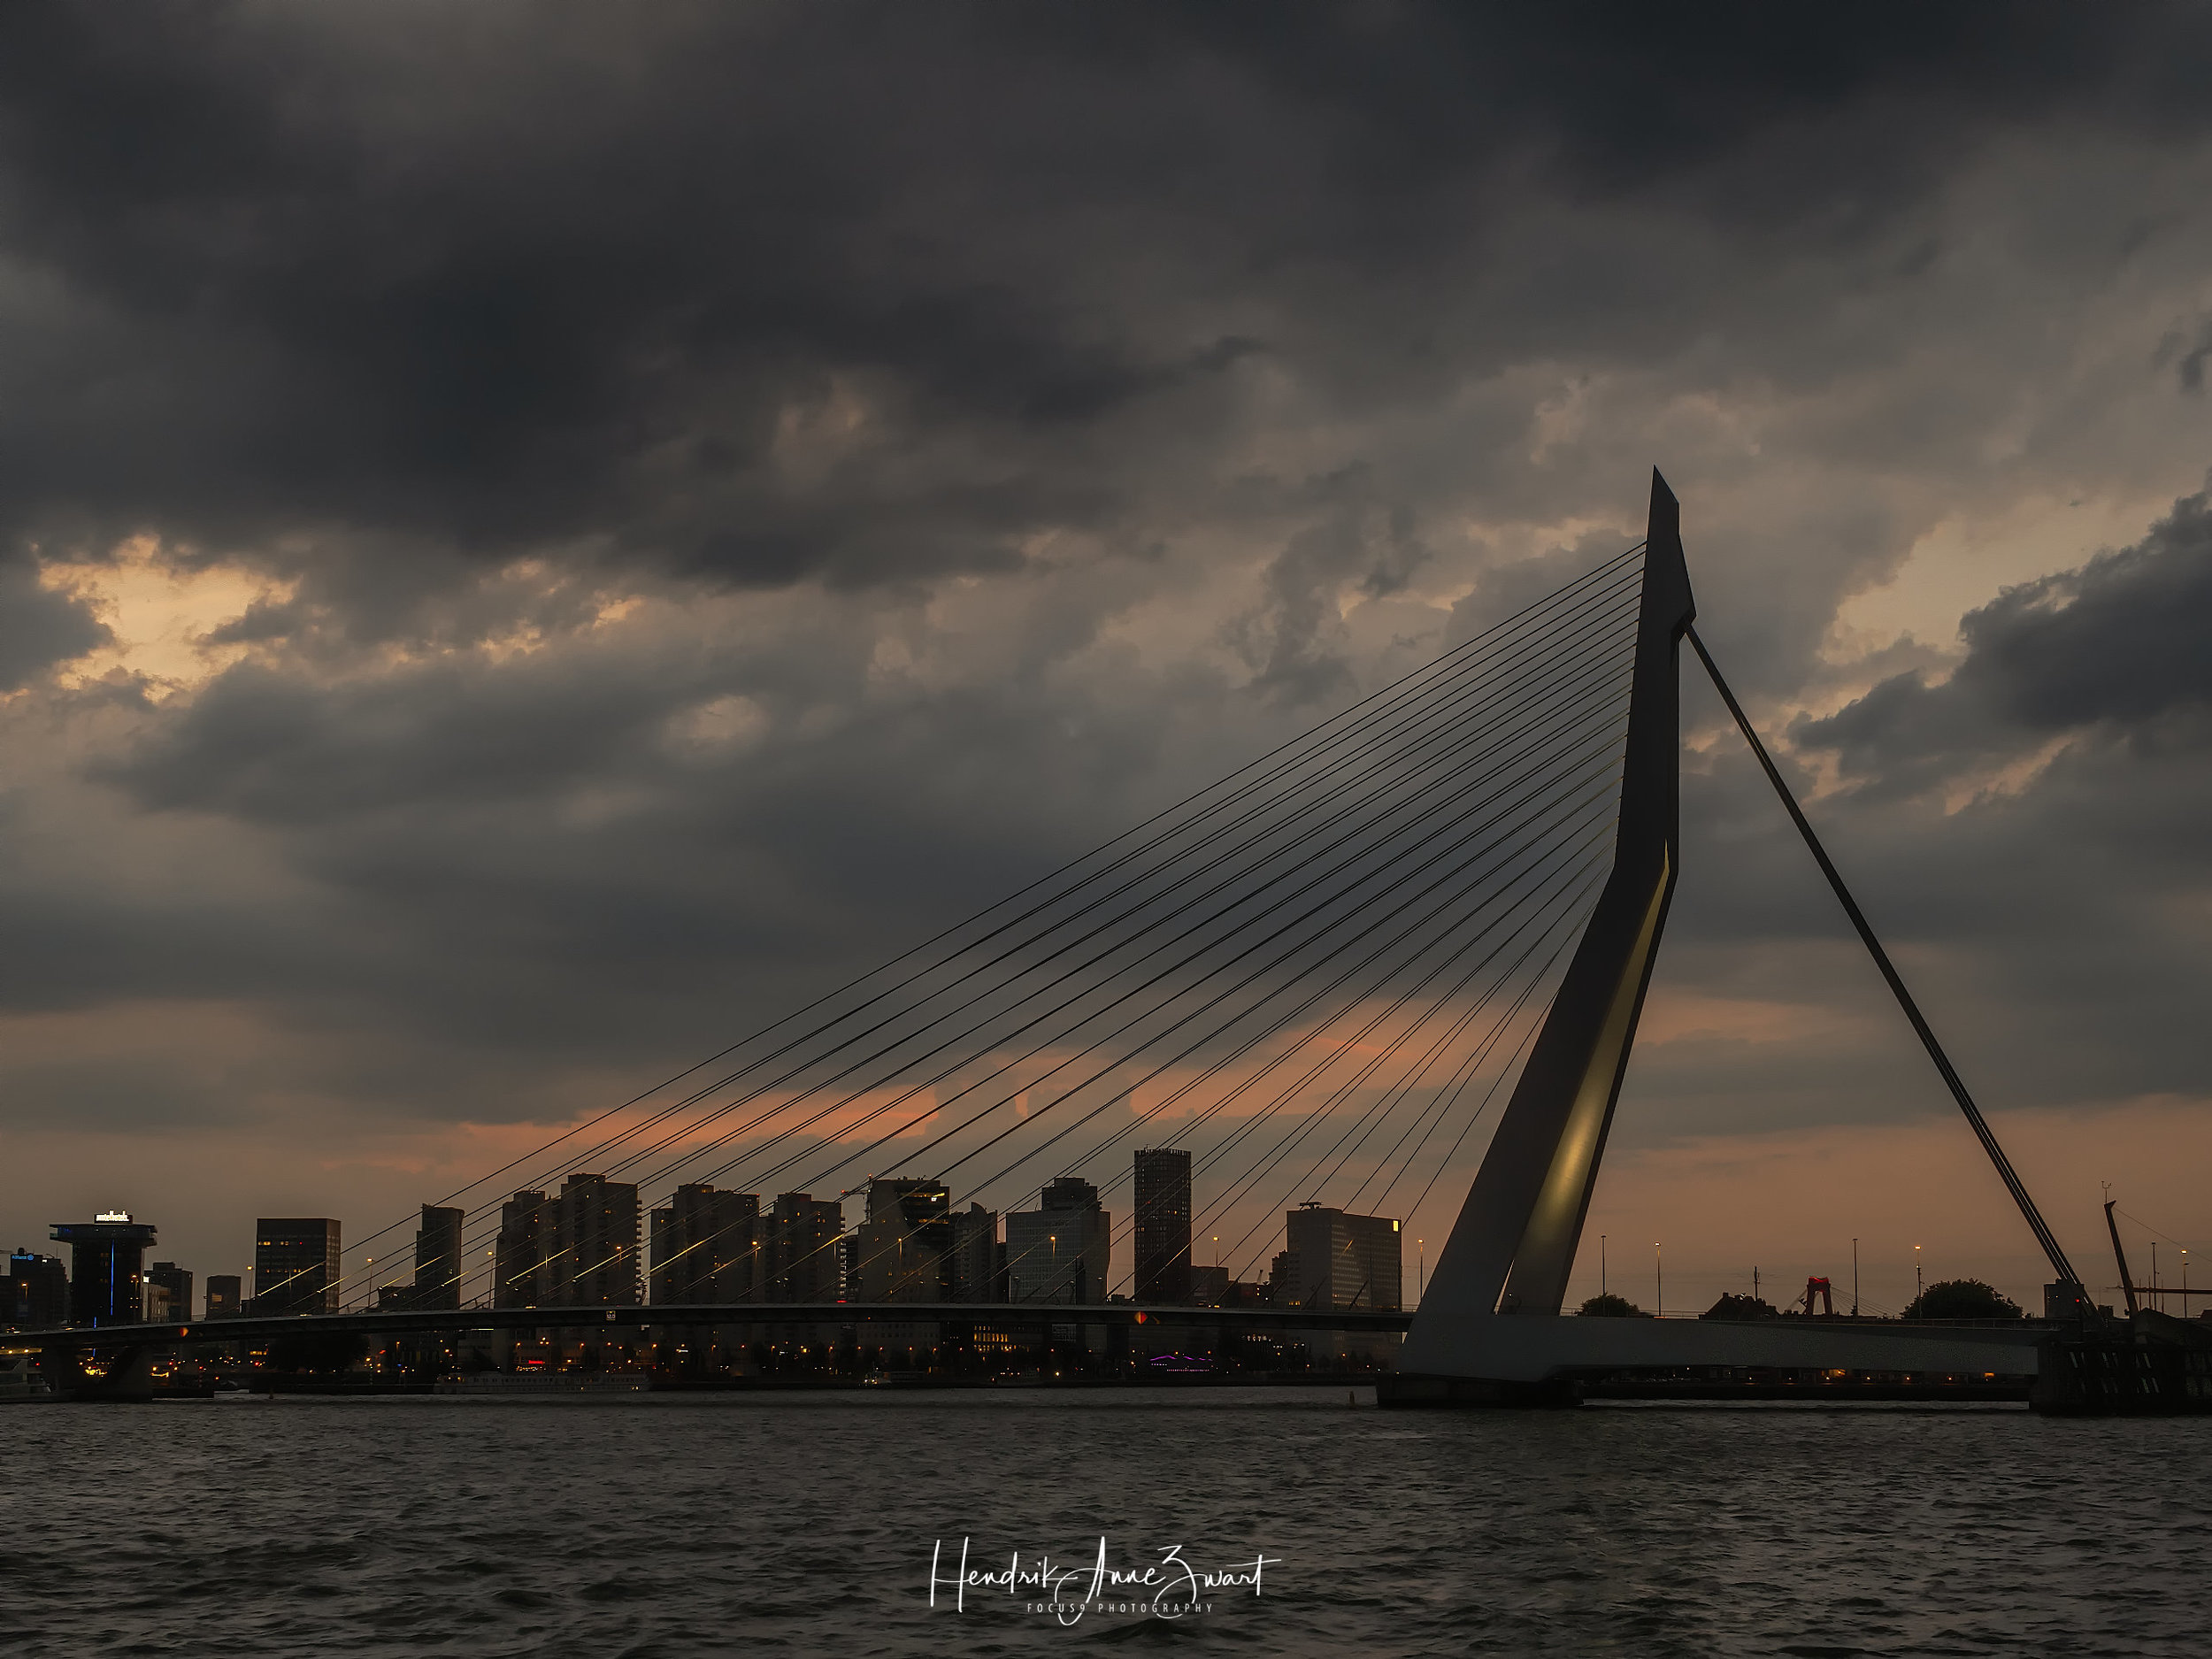 Rotterdam_Maas_Sunset_5.jpg